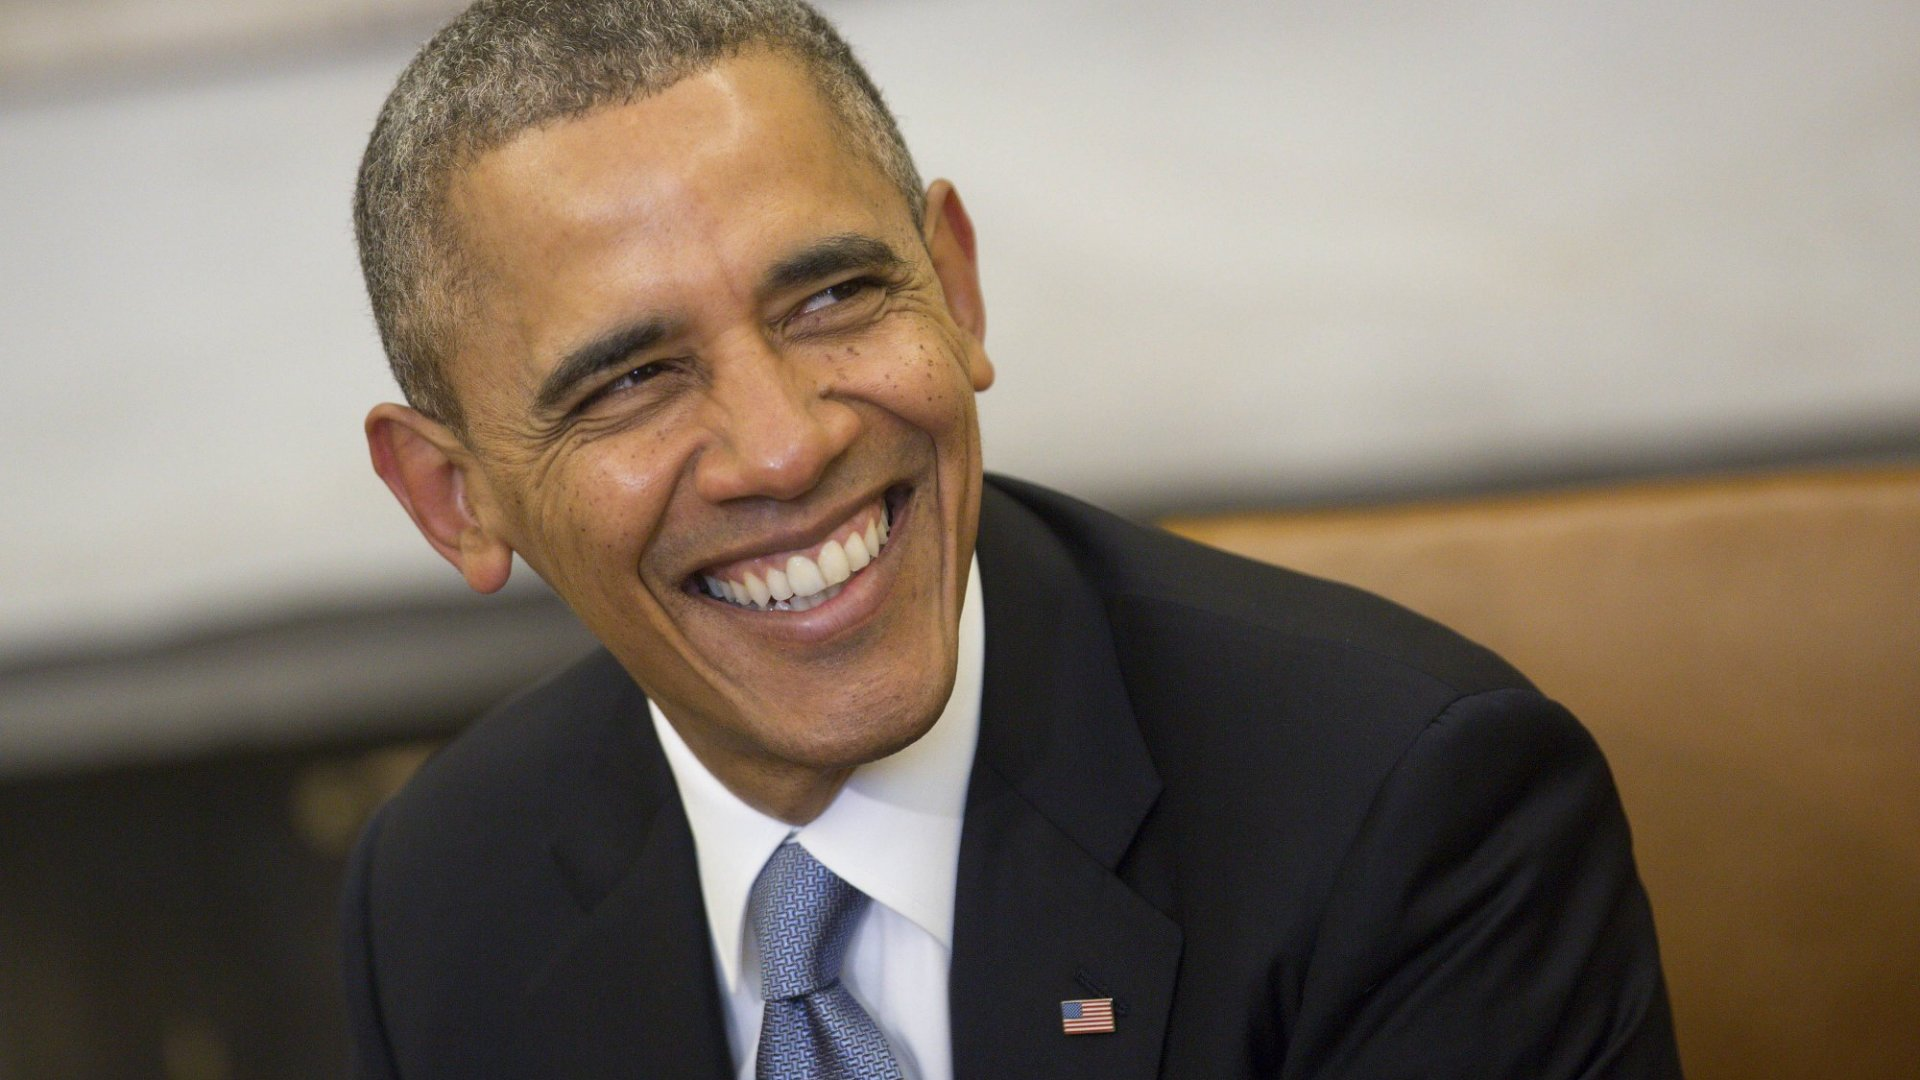 Senate Poised to Hand Obama Big Victory on Negotiating Trade